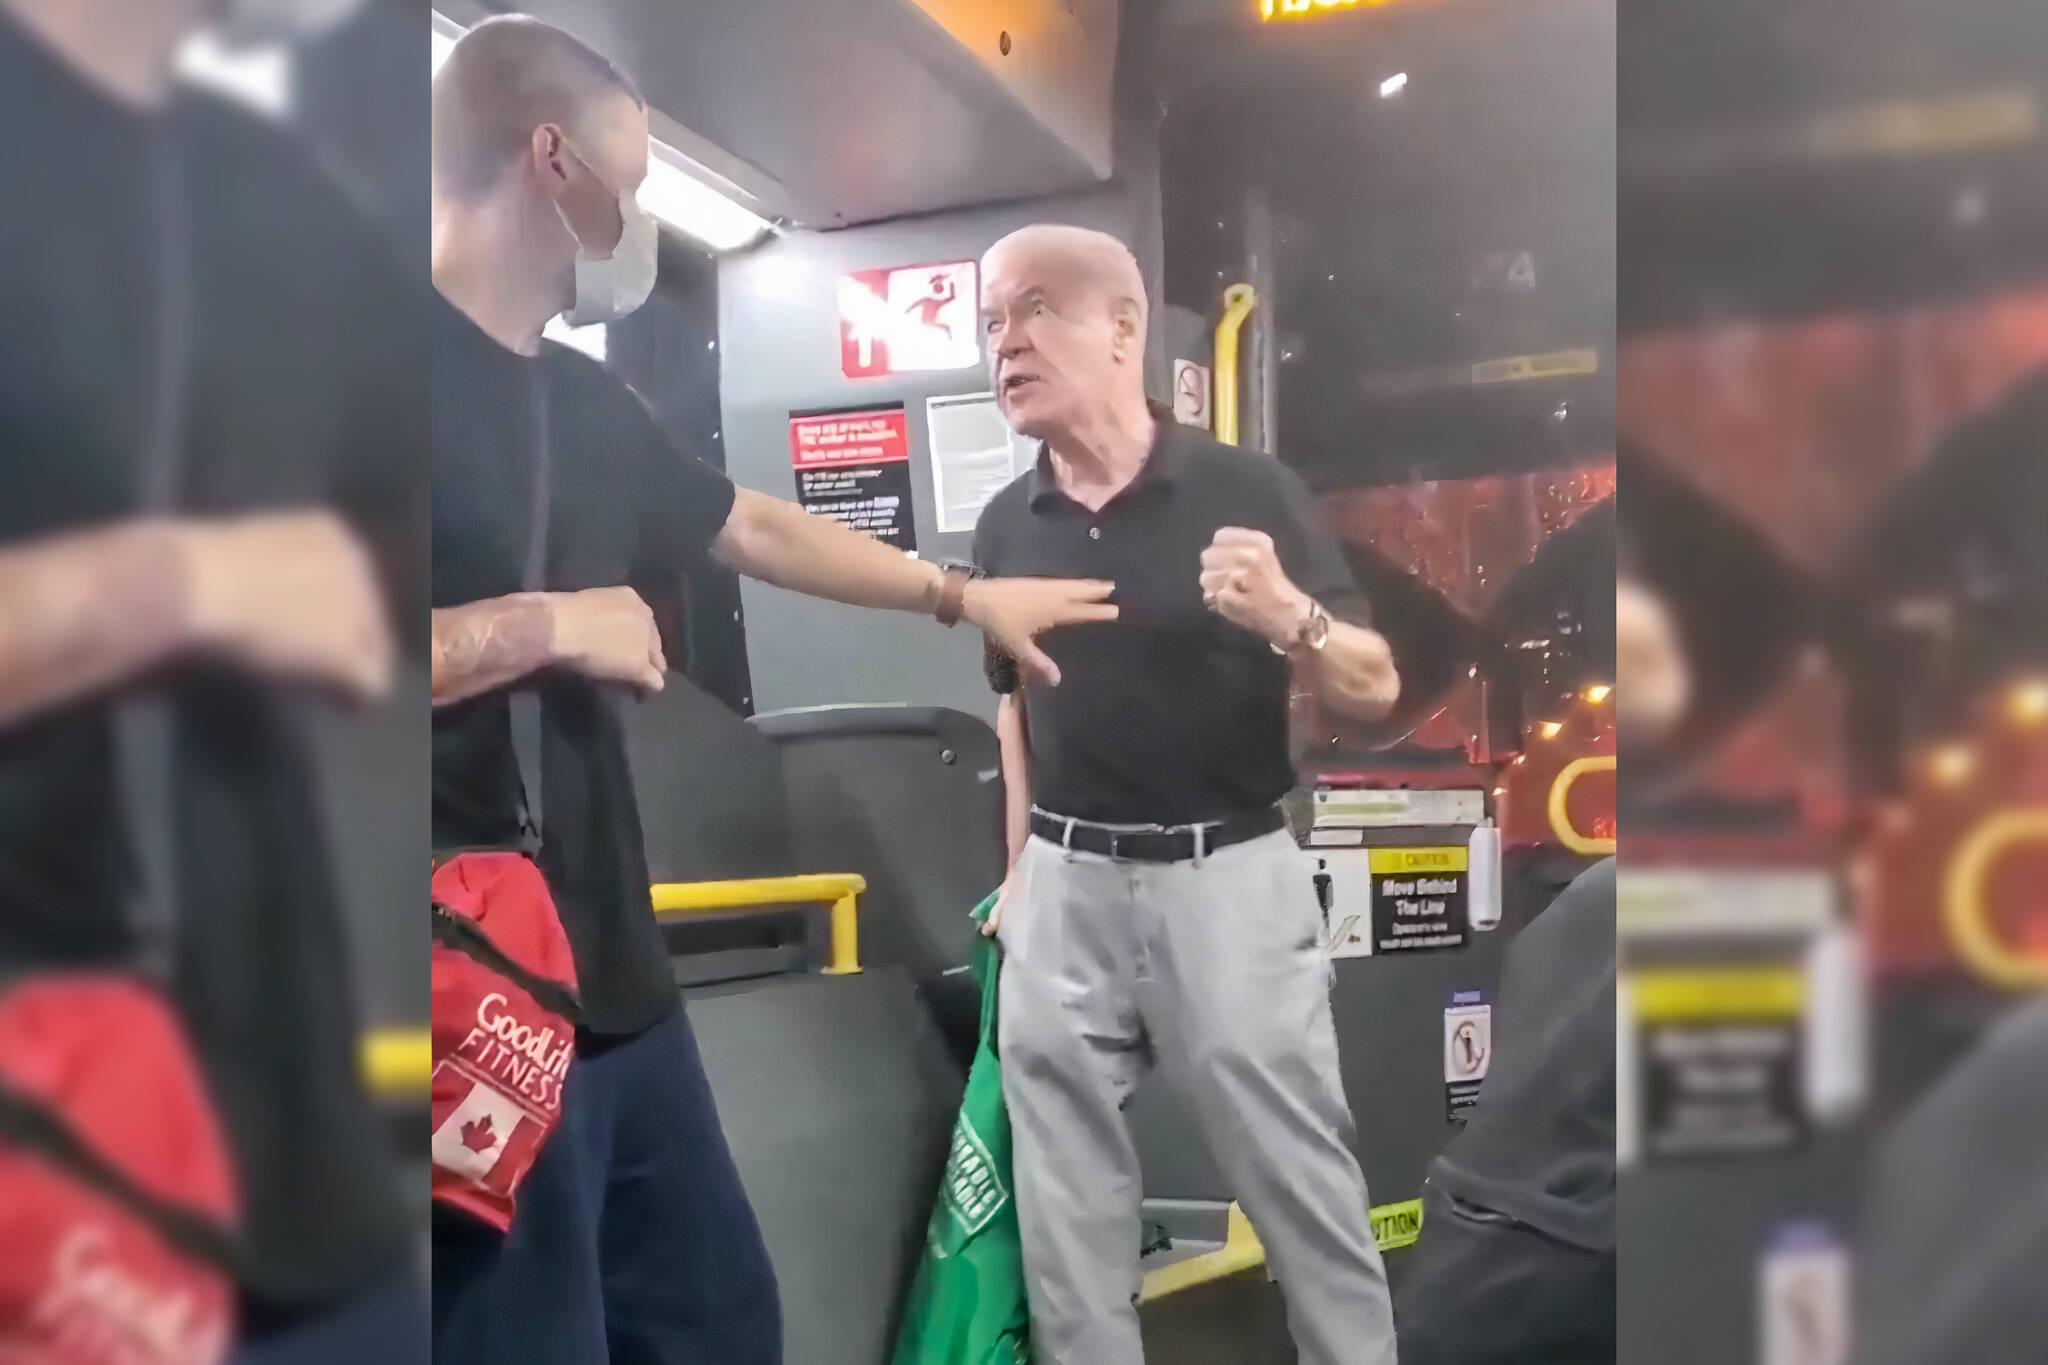 toronto bus fight